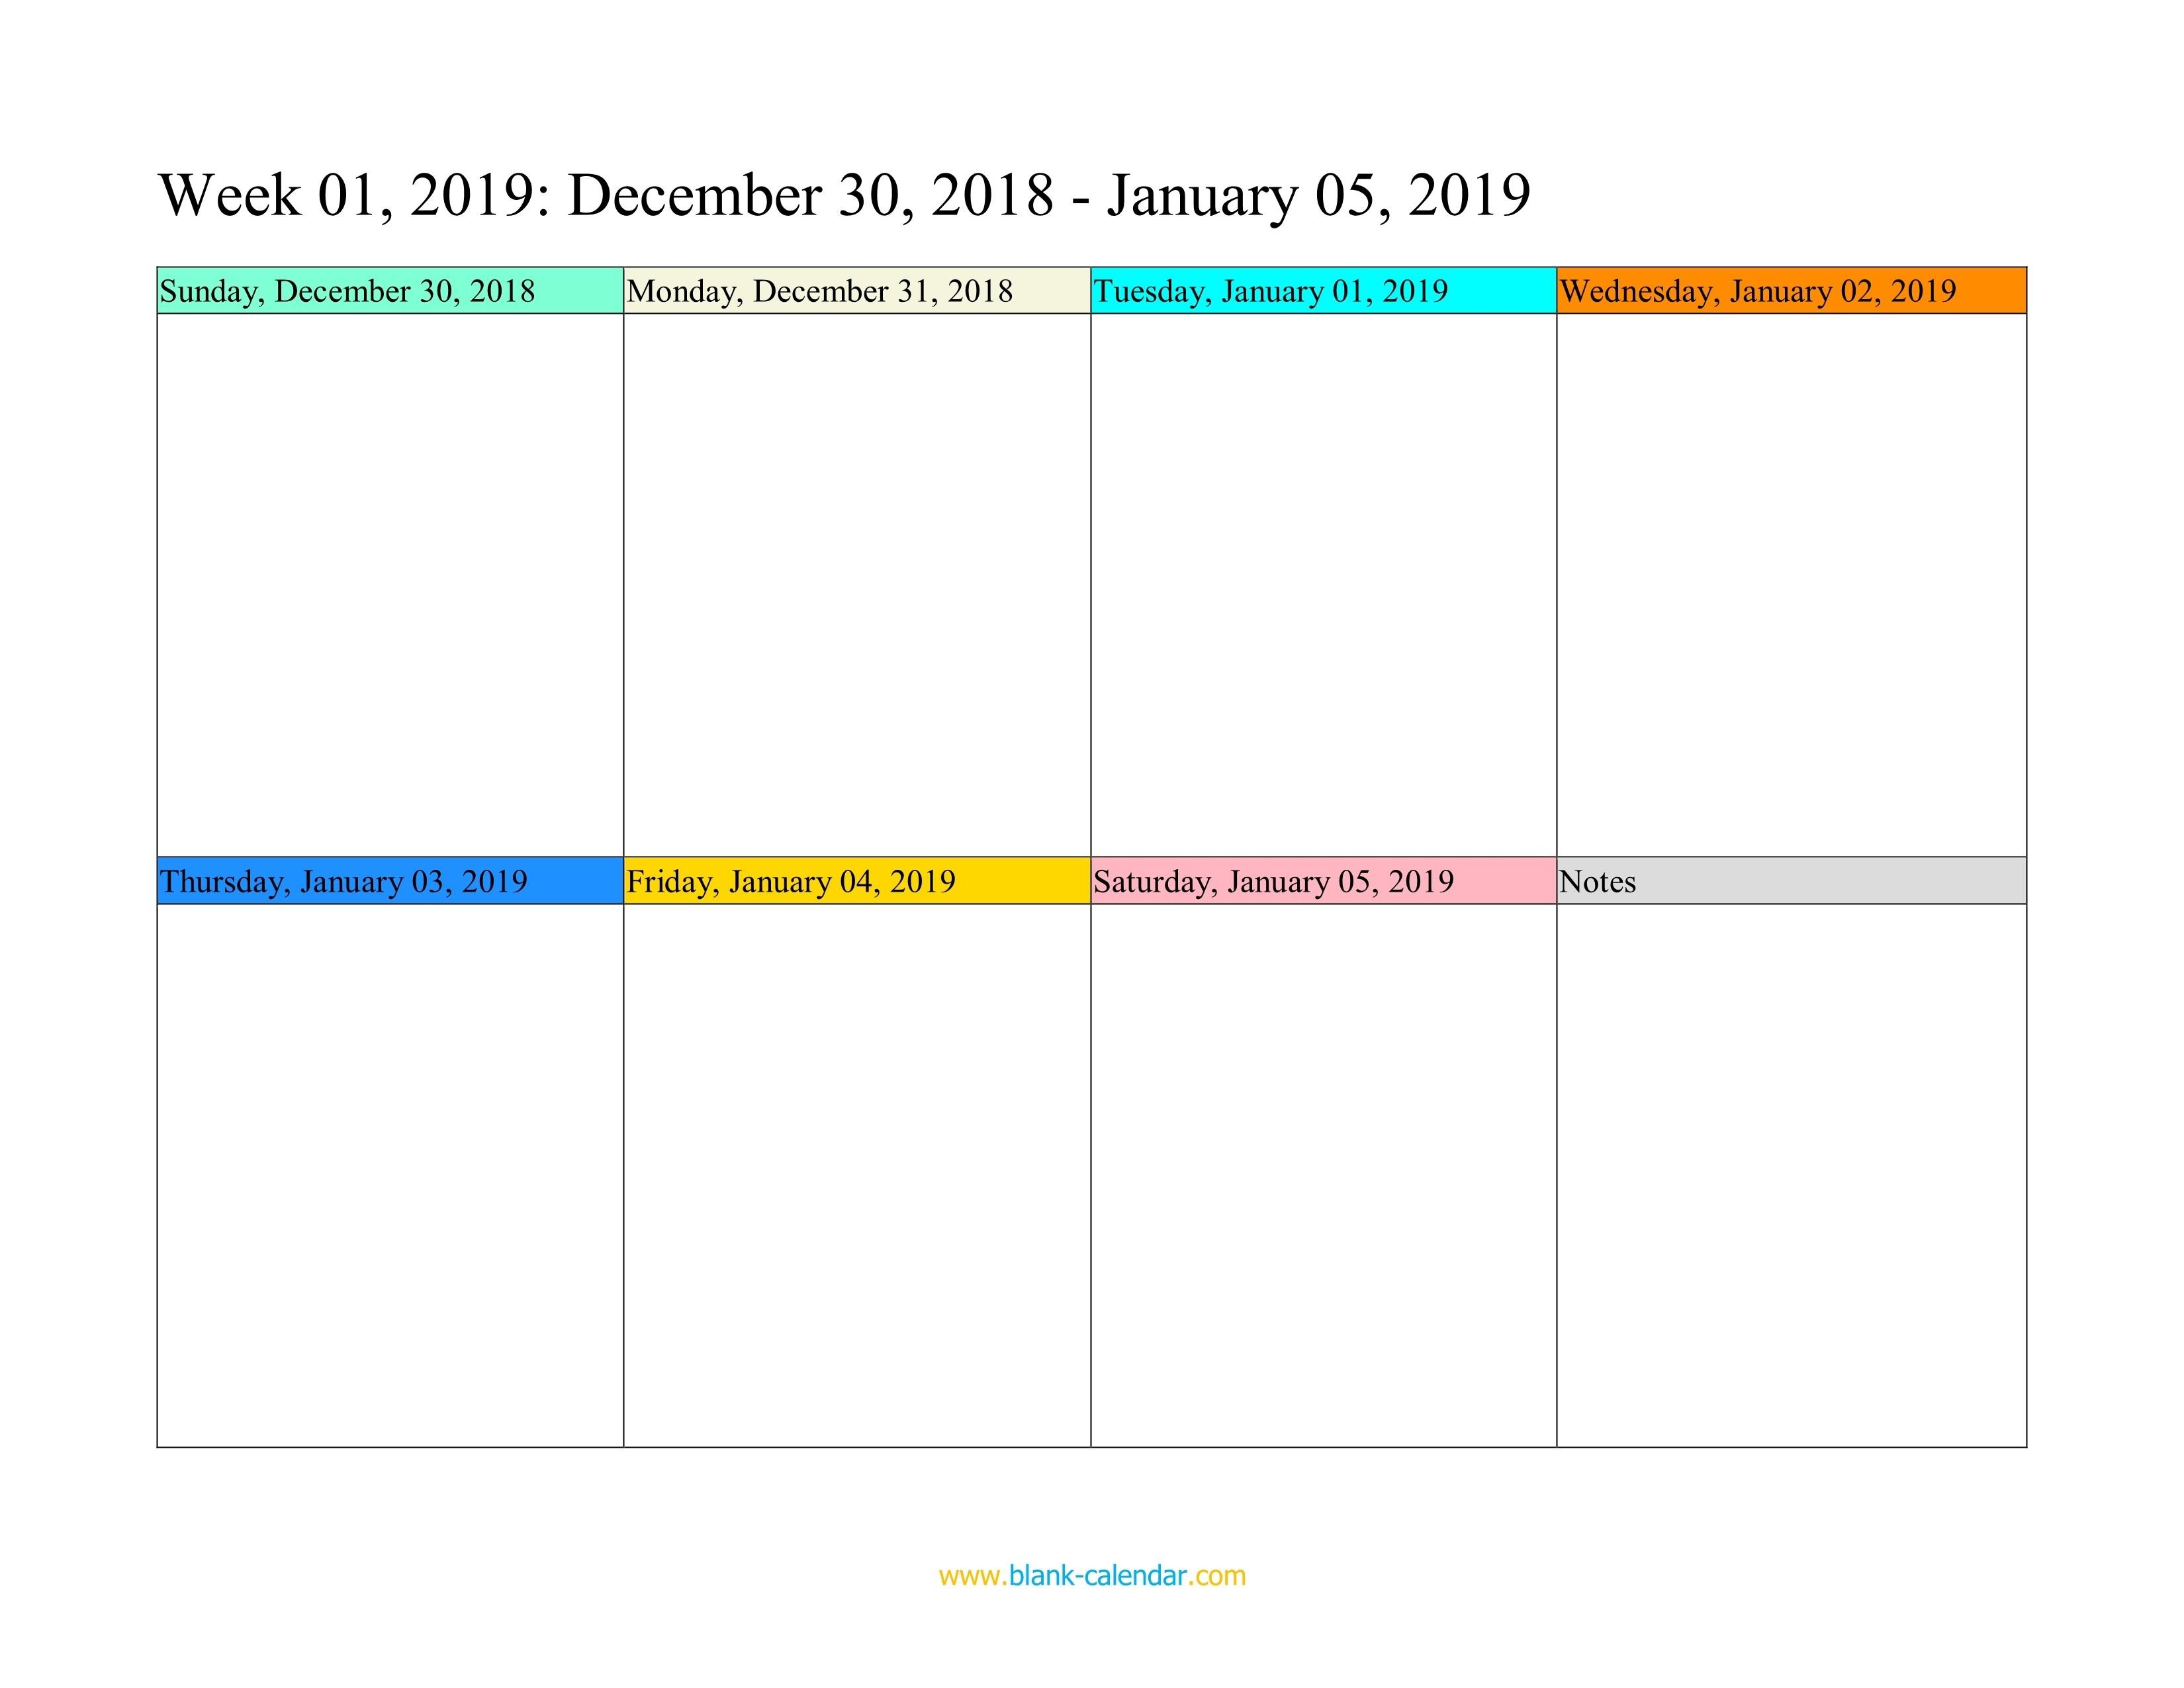 Free One Week Schedule Template | Ten Wall Calendar inside 2 Week Induction Timetable Free Template